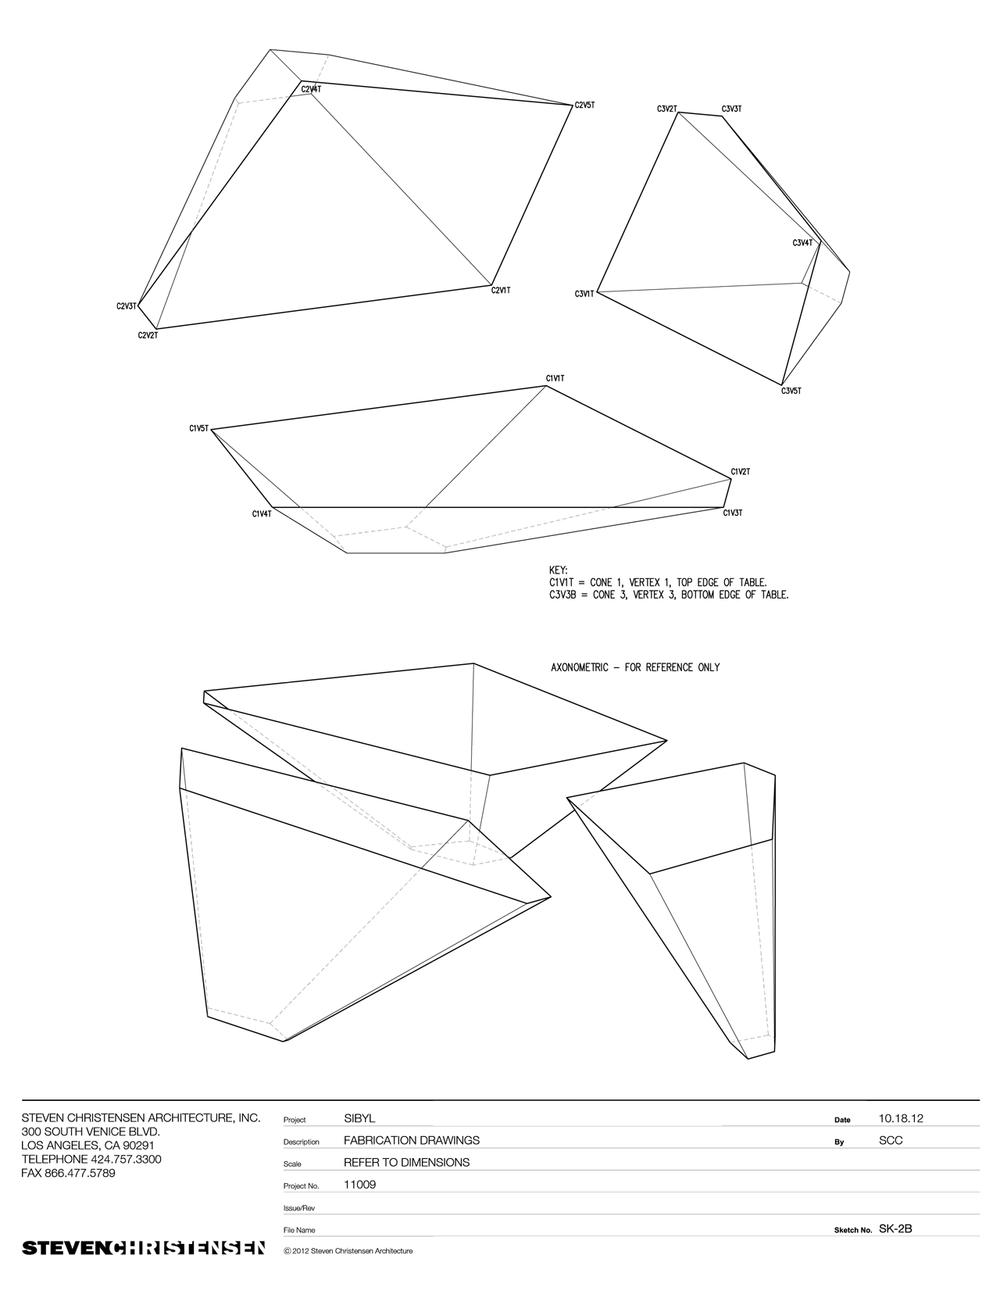 steven-christensen_sibyl_fabrication-drawings_2B_1280.png